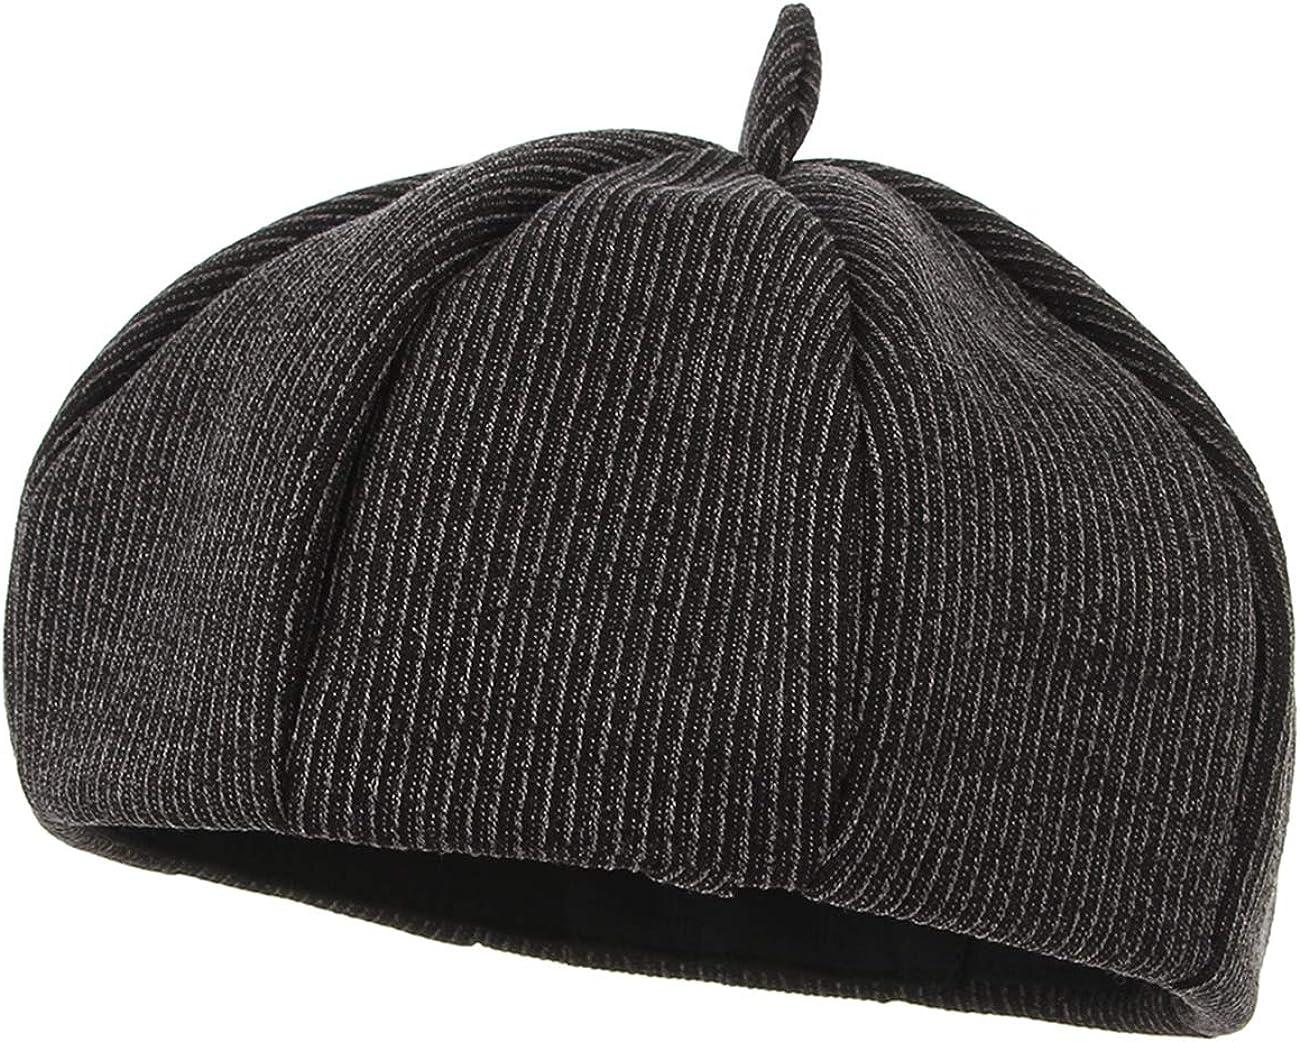 GEMVIE Women Felt French Fiddler Artist Cap Vintage Adjustable Cotton Beret Hat for Fall Winter